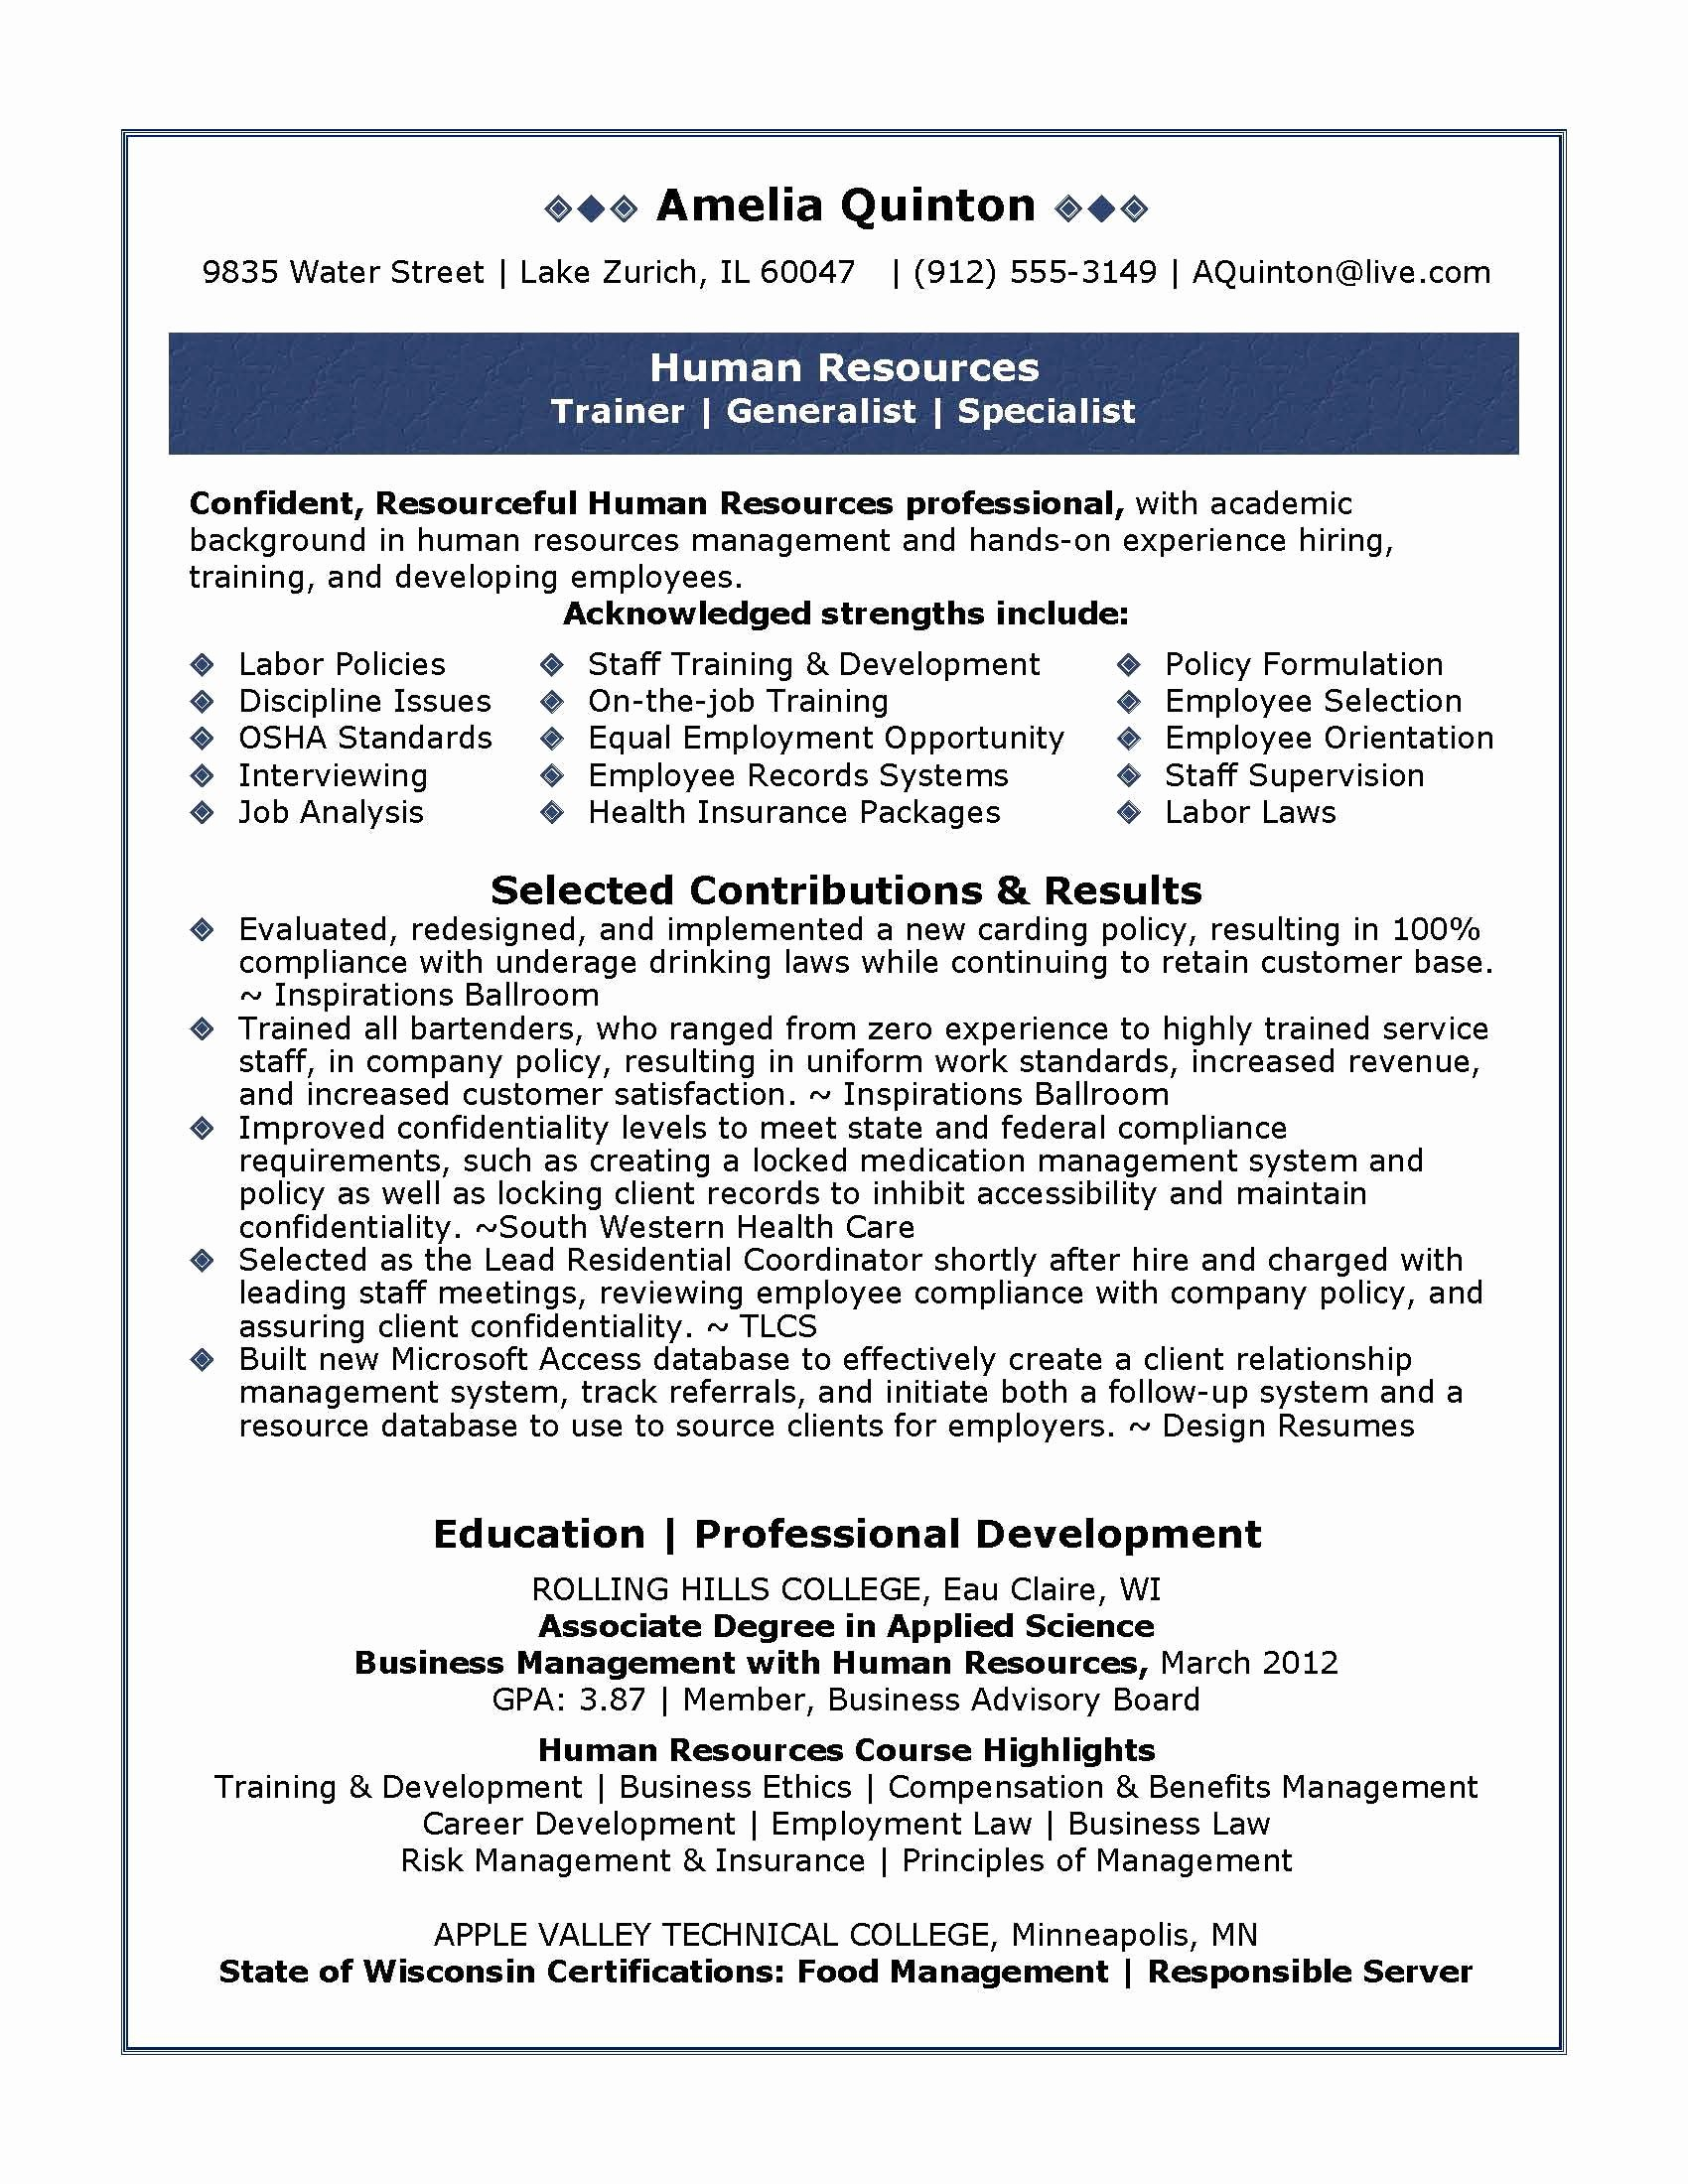 Human Resources Resume Summary Examples Bongdaao